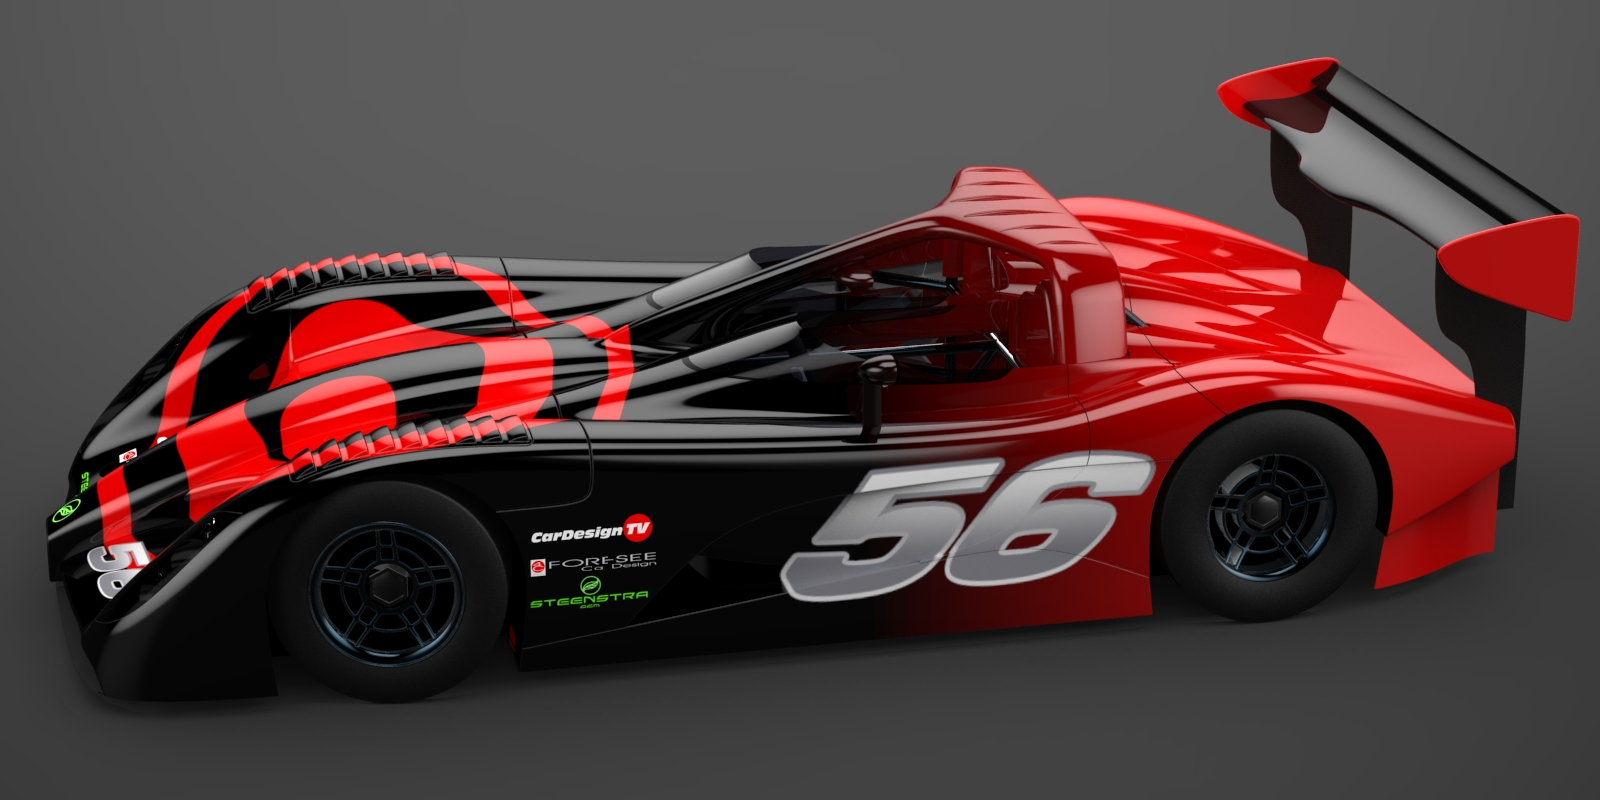 Designing A Safe And Affordable Endurance Race Car For Amateurs